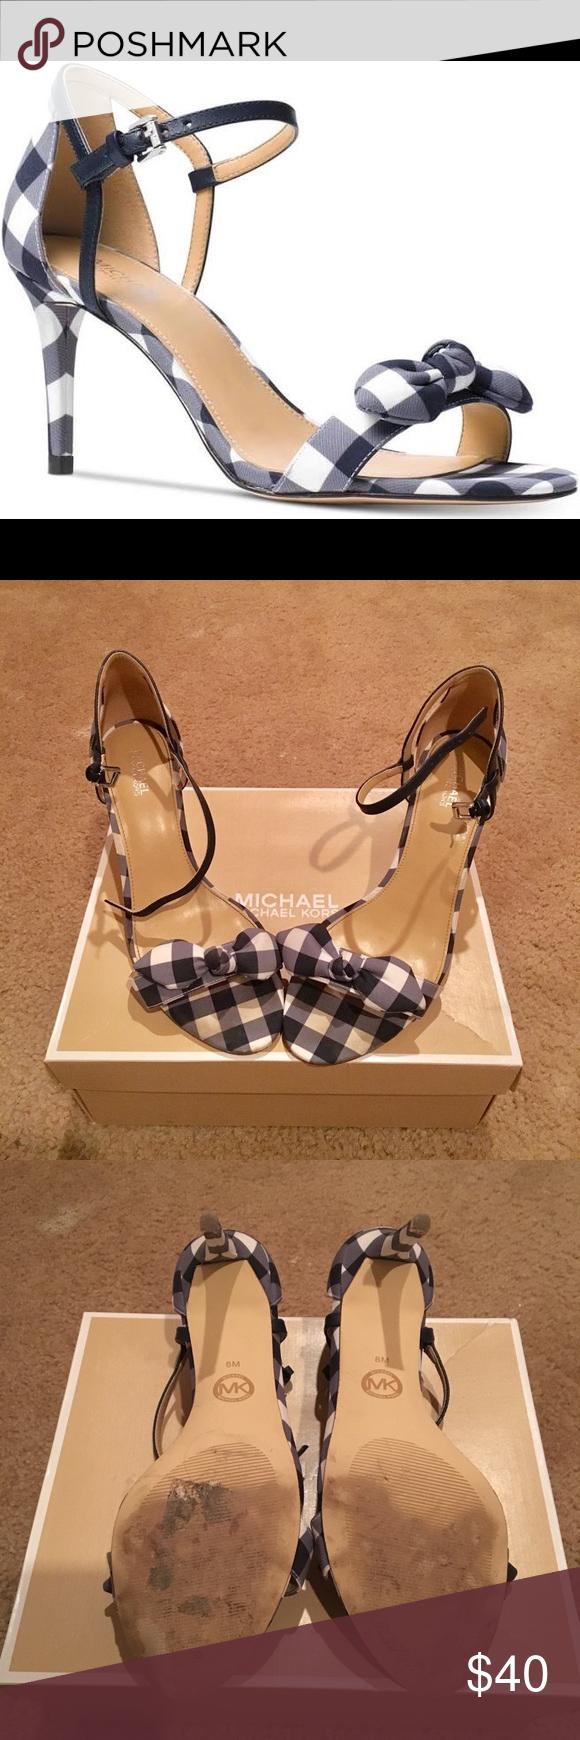 d50c28eb4aa Spotted while shopping on Poshmark  Women s Michael Kors Plaid Blue   White  Heels!  poshmark  fashion  shopping  style  Michael Kors  Shoes